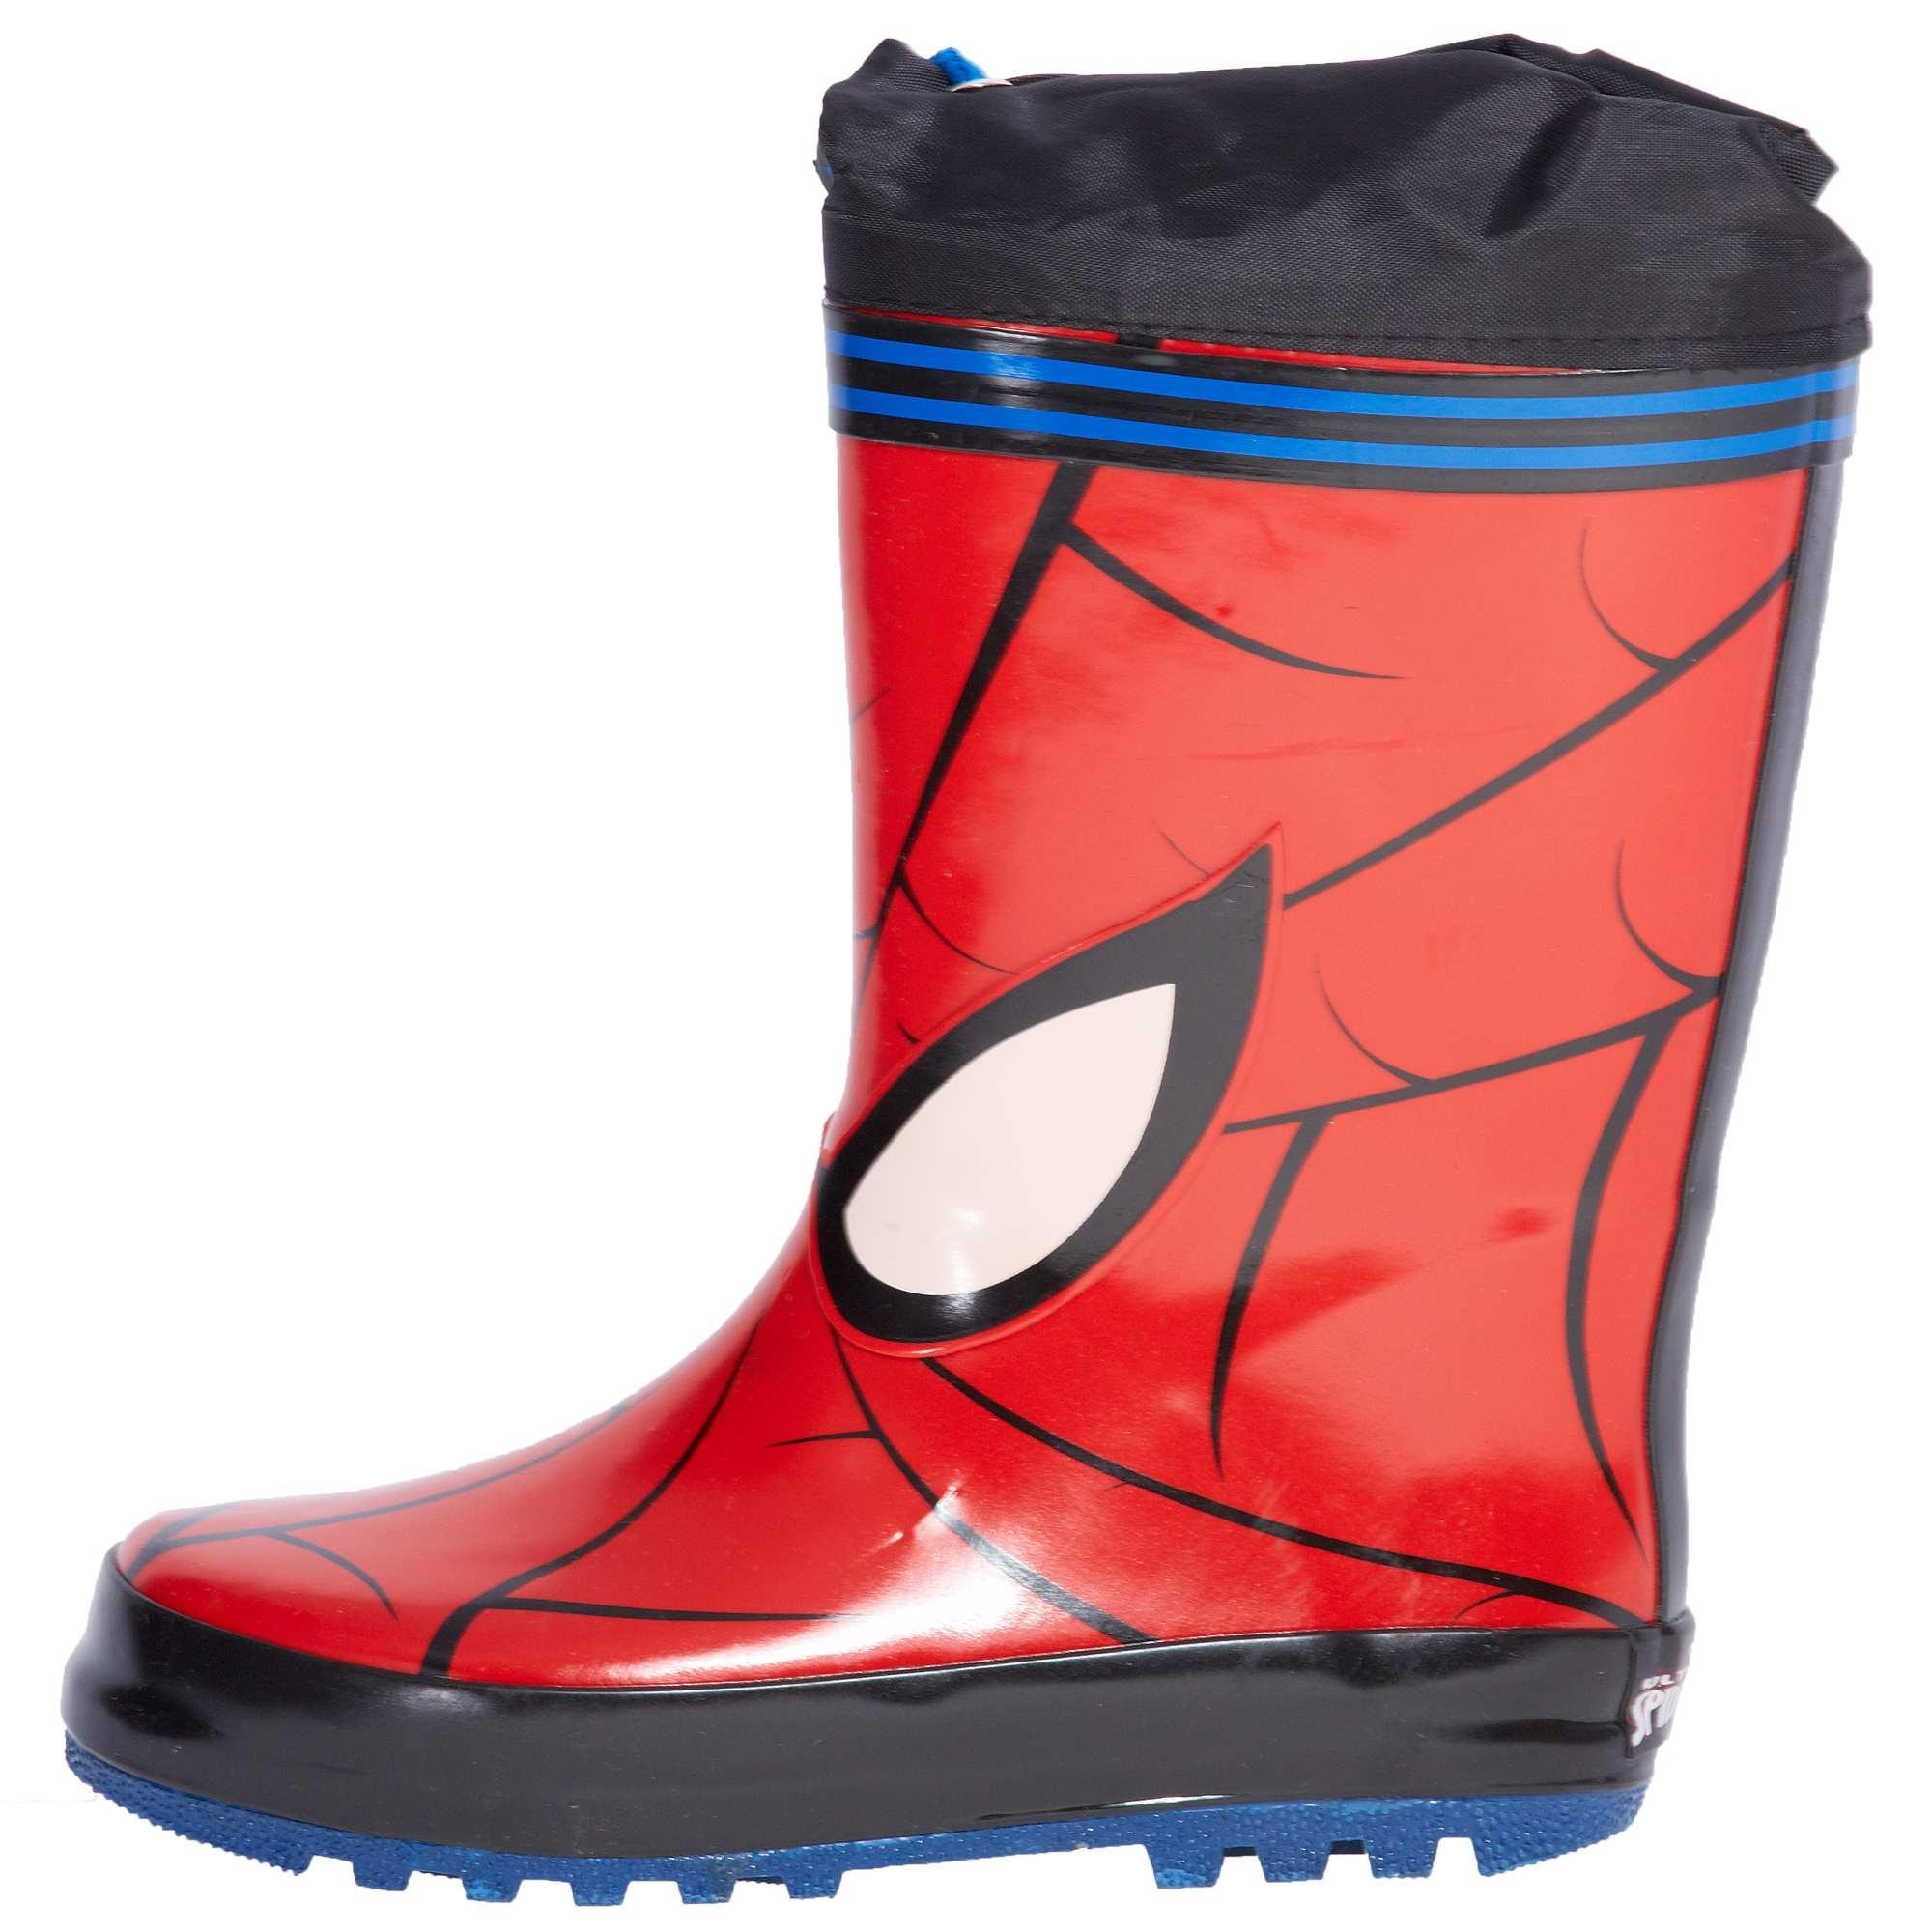 d1ac8cdb58a60 stivali pioggia bambino kiabi spiderman 16